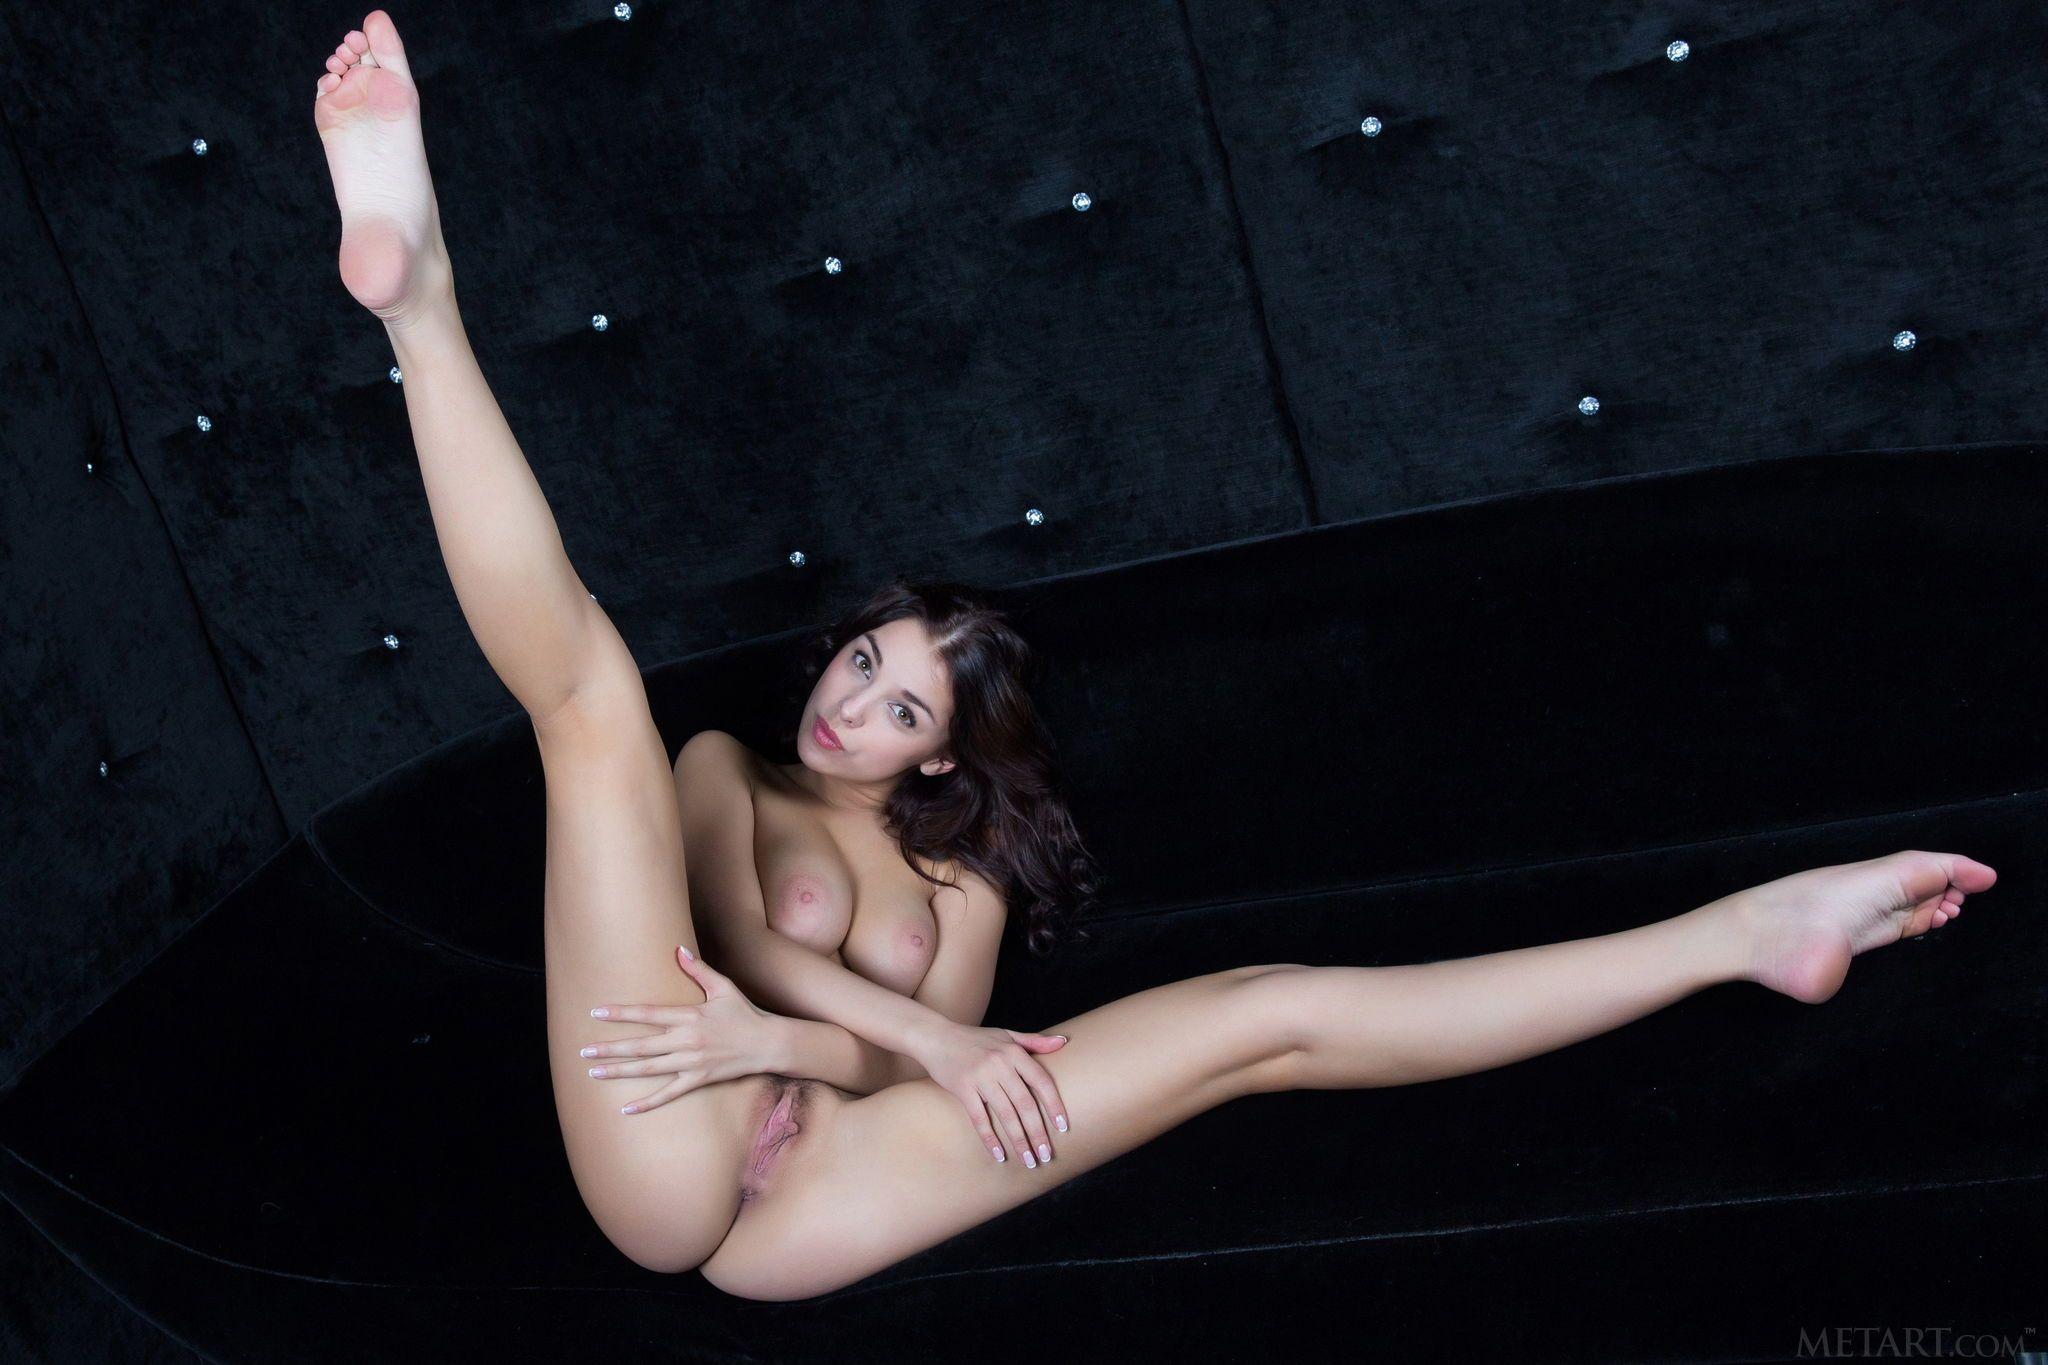 Nude pics of Evita Lim